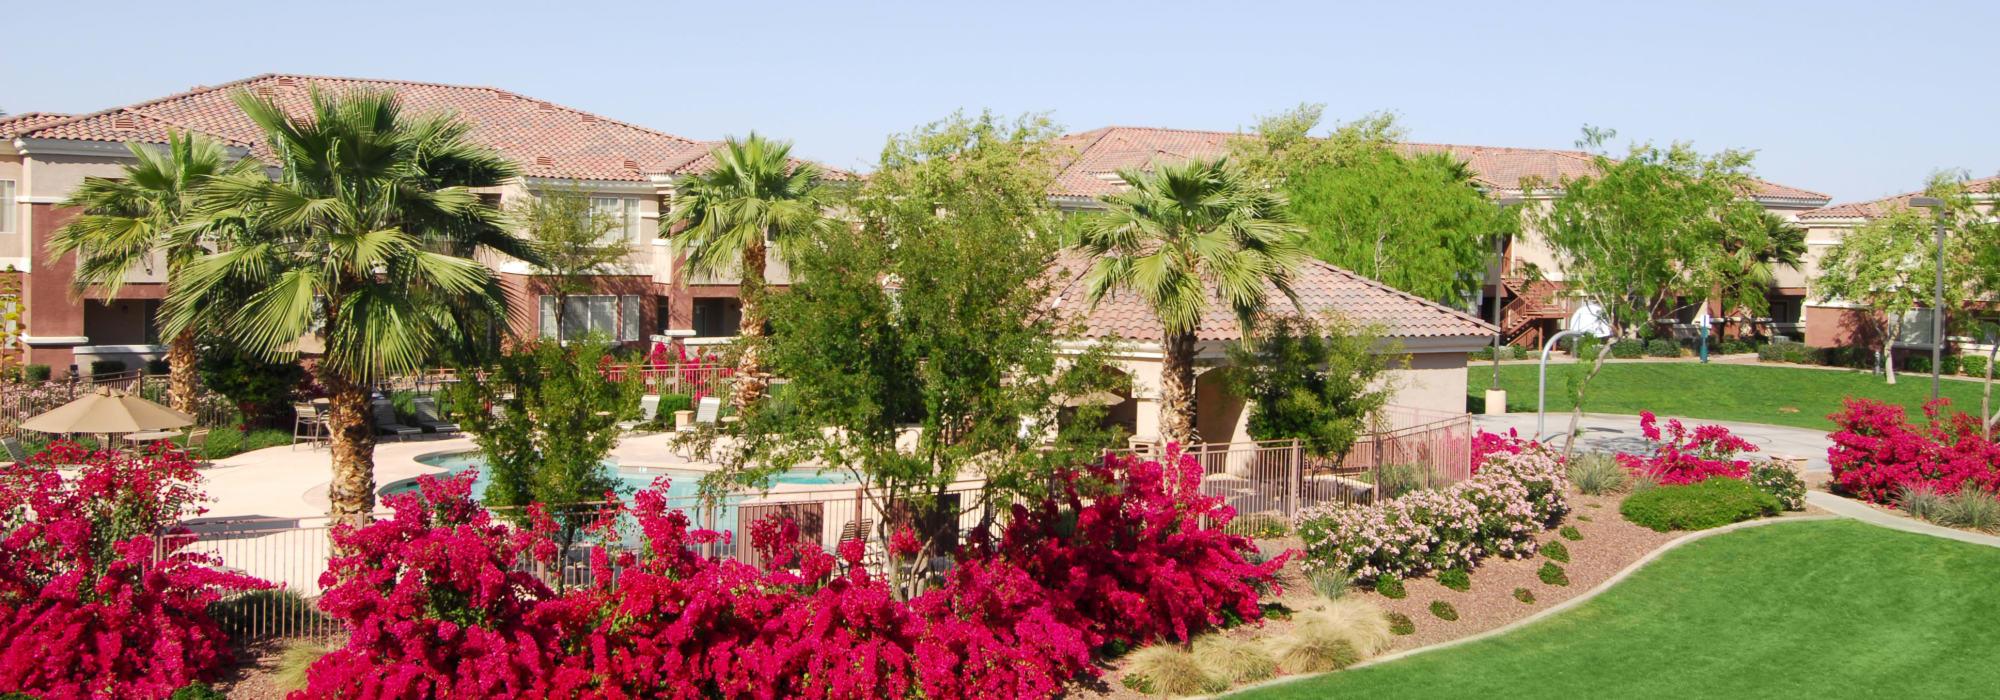 Beautiful landscaping surrounds Remington Ranch in Litchfield Park, Arizona